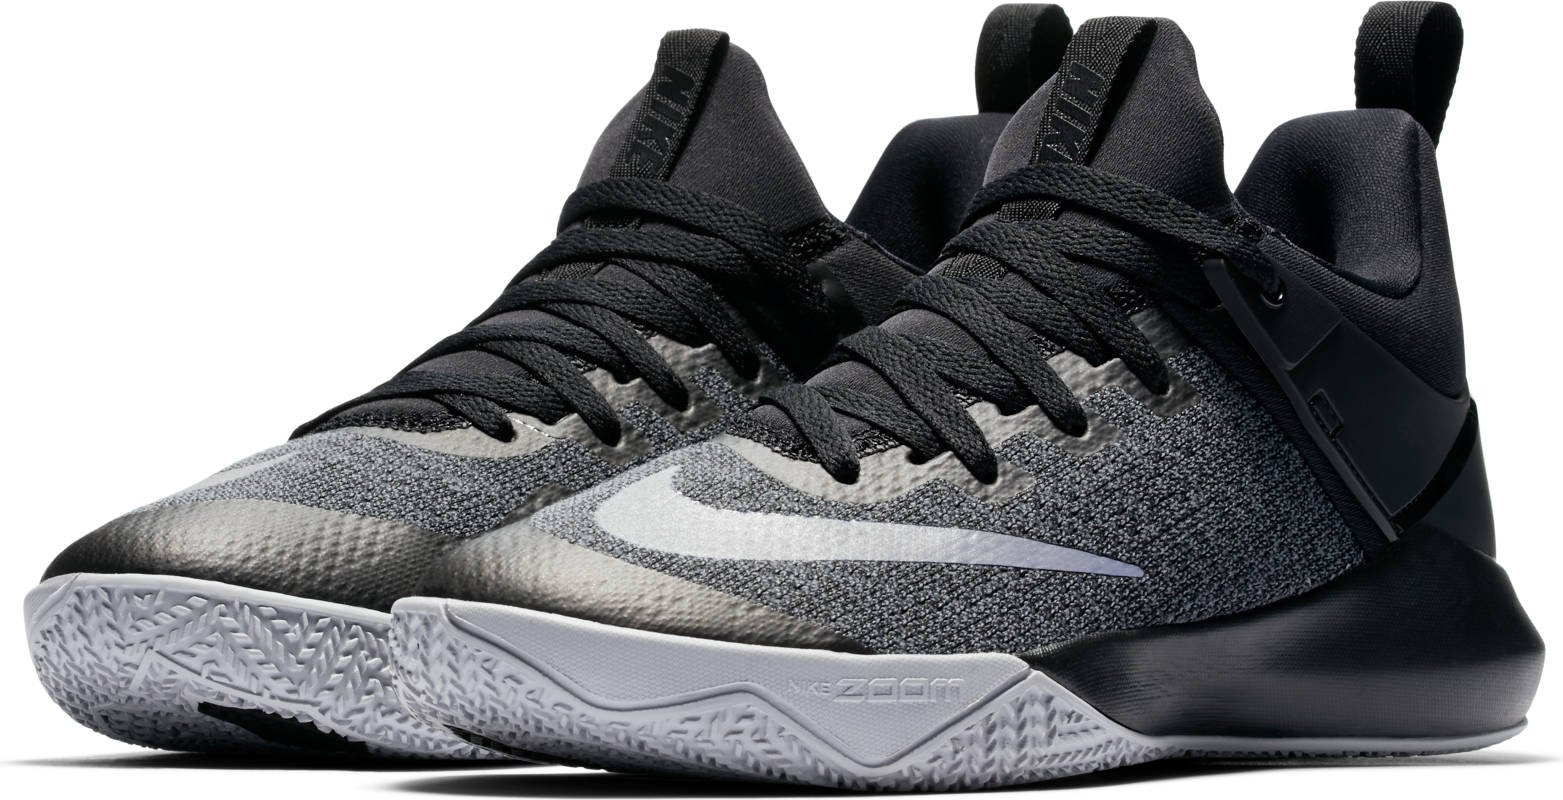 Women's Nike Zoom Shift Basketball Shoe Black/Chrome/Wolf Grey Size 7 M US by NIKE (Image #1)